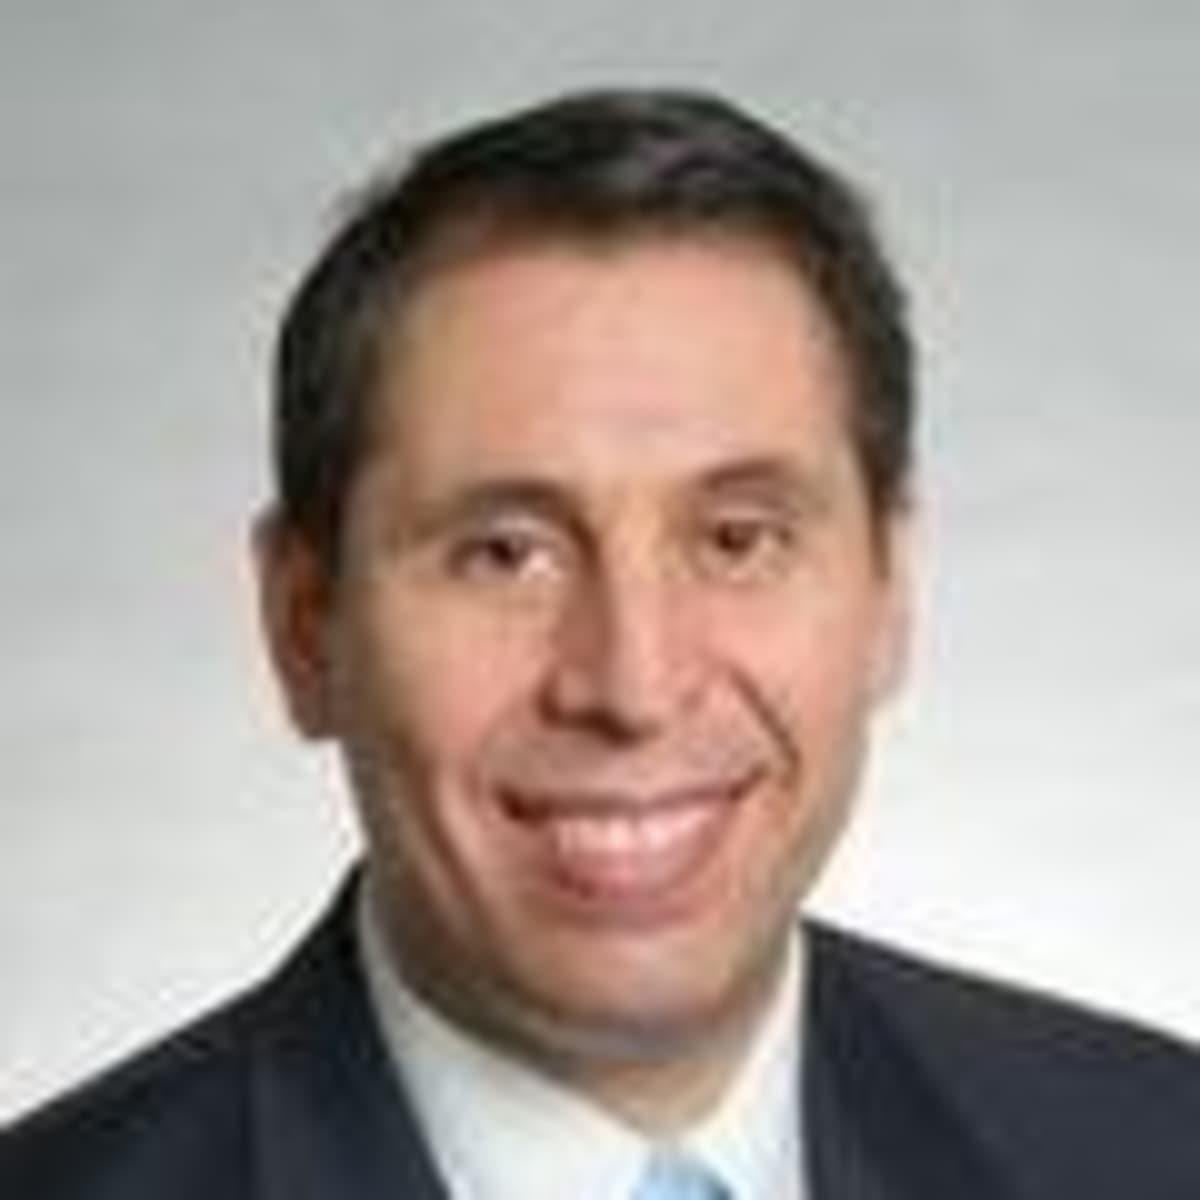 Dr Joseph Onorato Md Garden City Ny Dermatologist